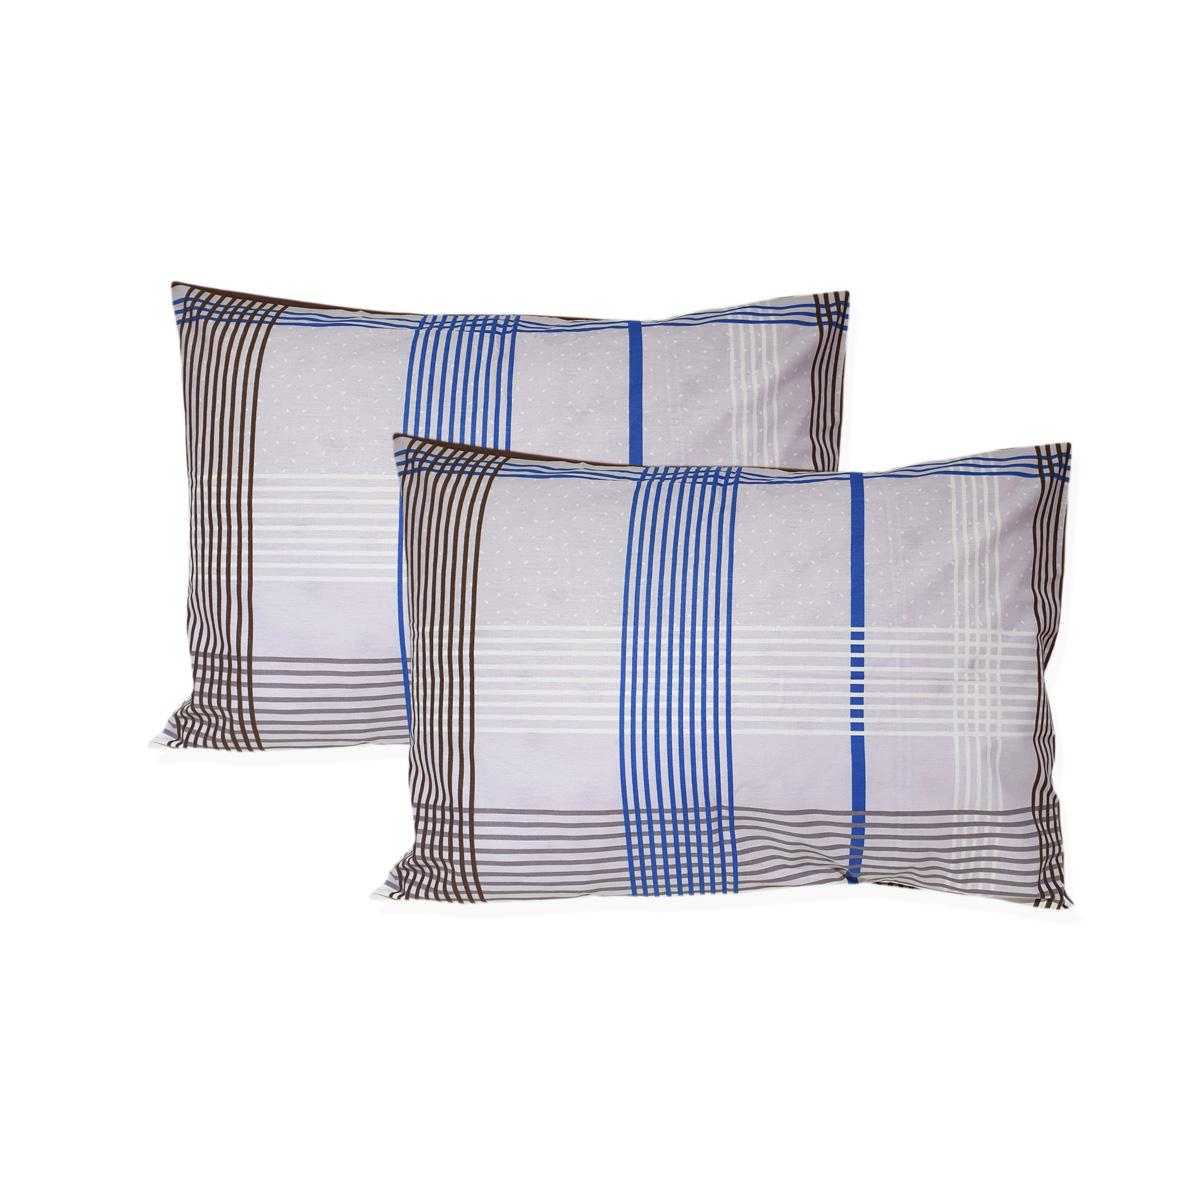 Leonado Vicenti  Kissenbezug Kissenhülle 40 x 60 cm 100/% Baumwolle 2er Pack